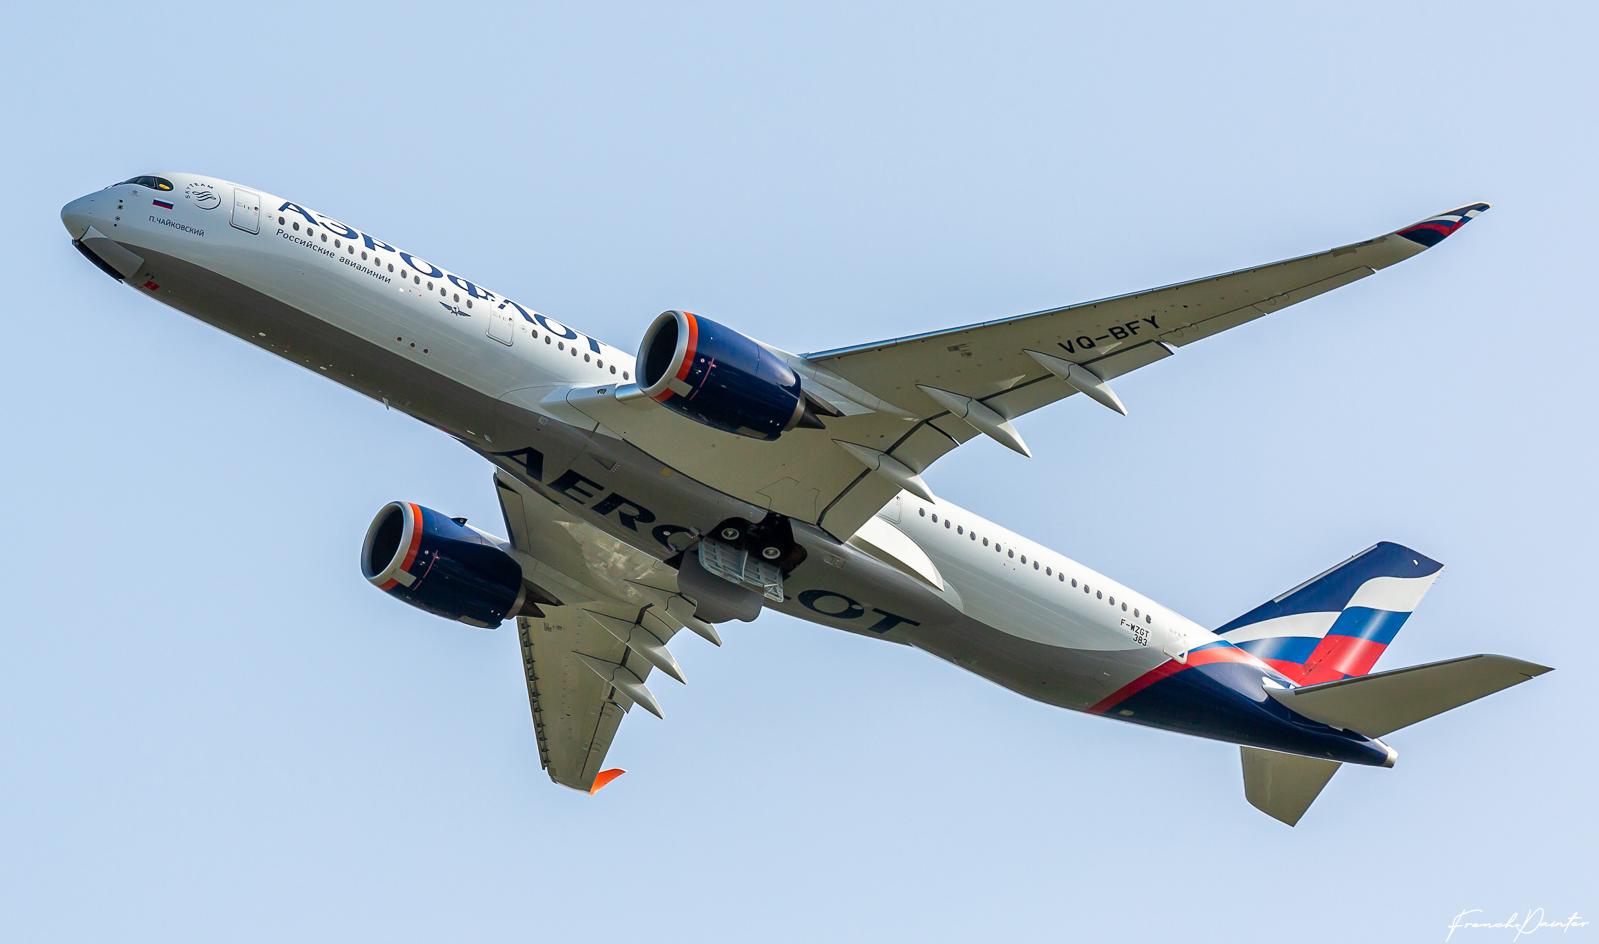 Aeroflot ! SU ! AFL - Page 3 EP2IjTgWoAA3sJL?format=jpg&name=large